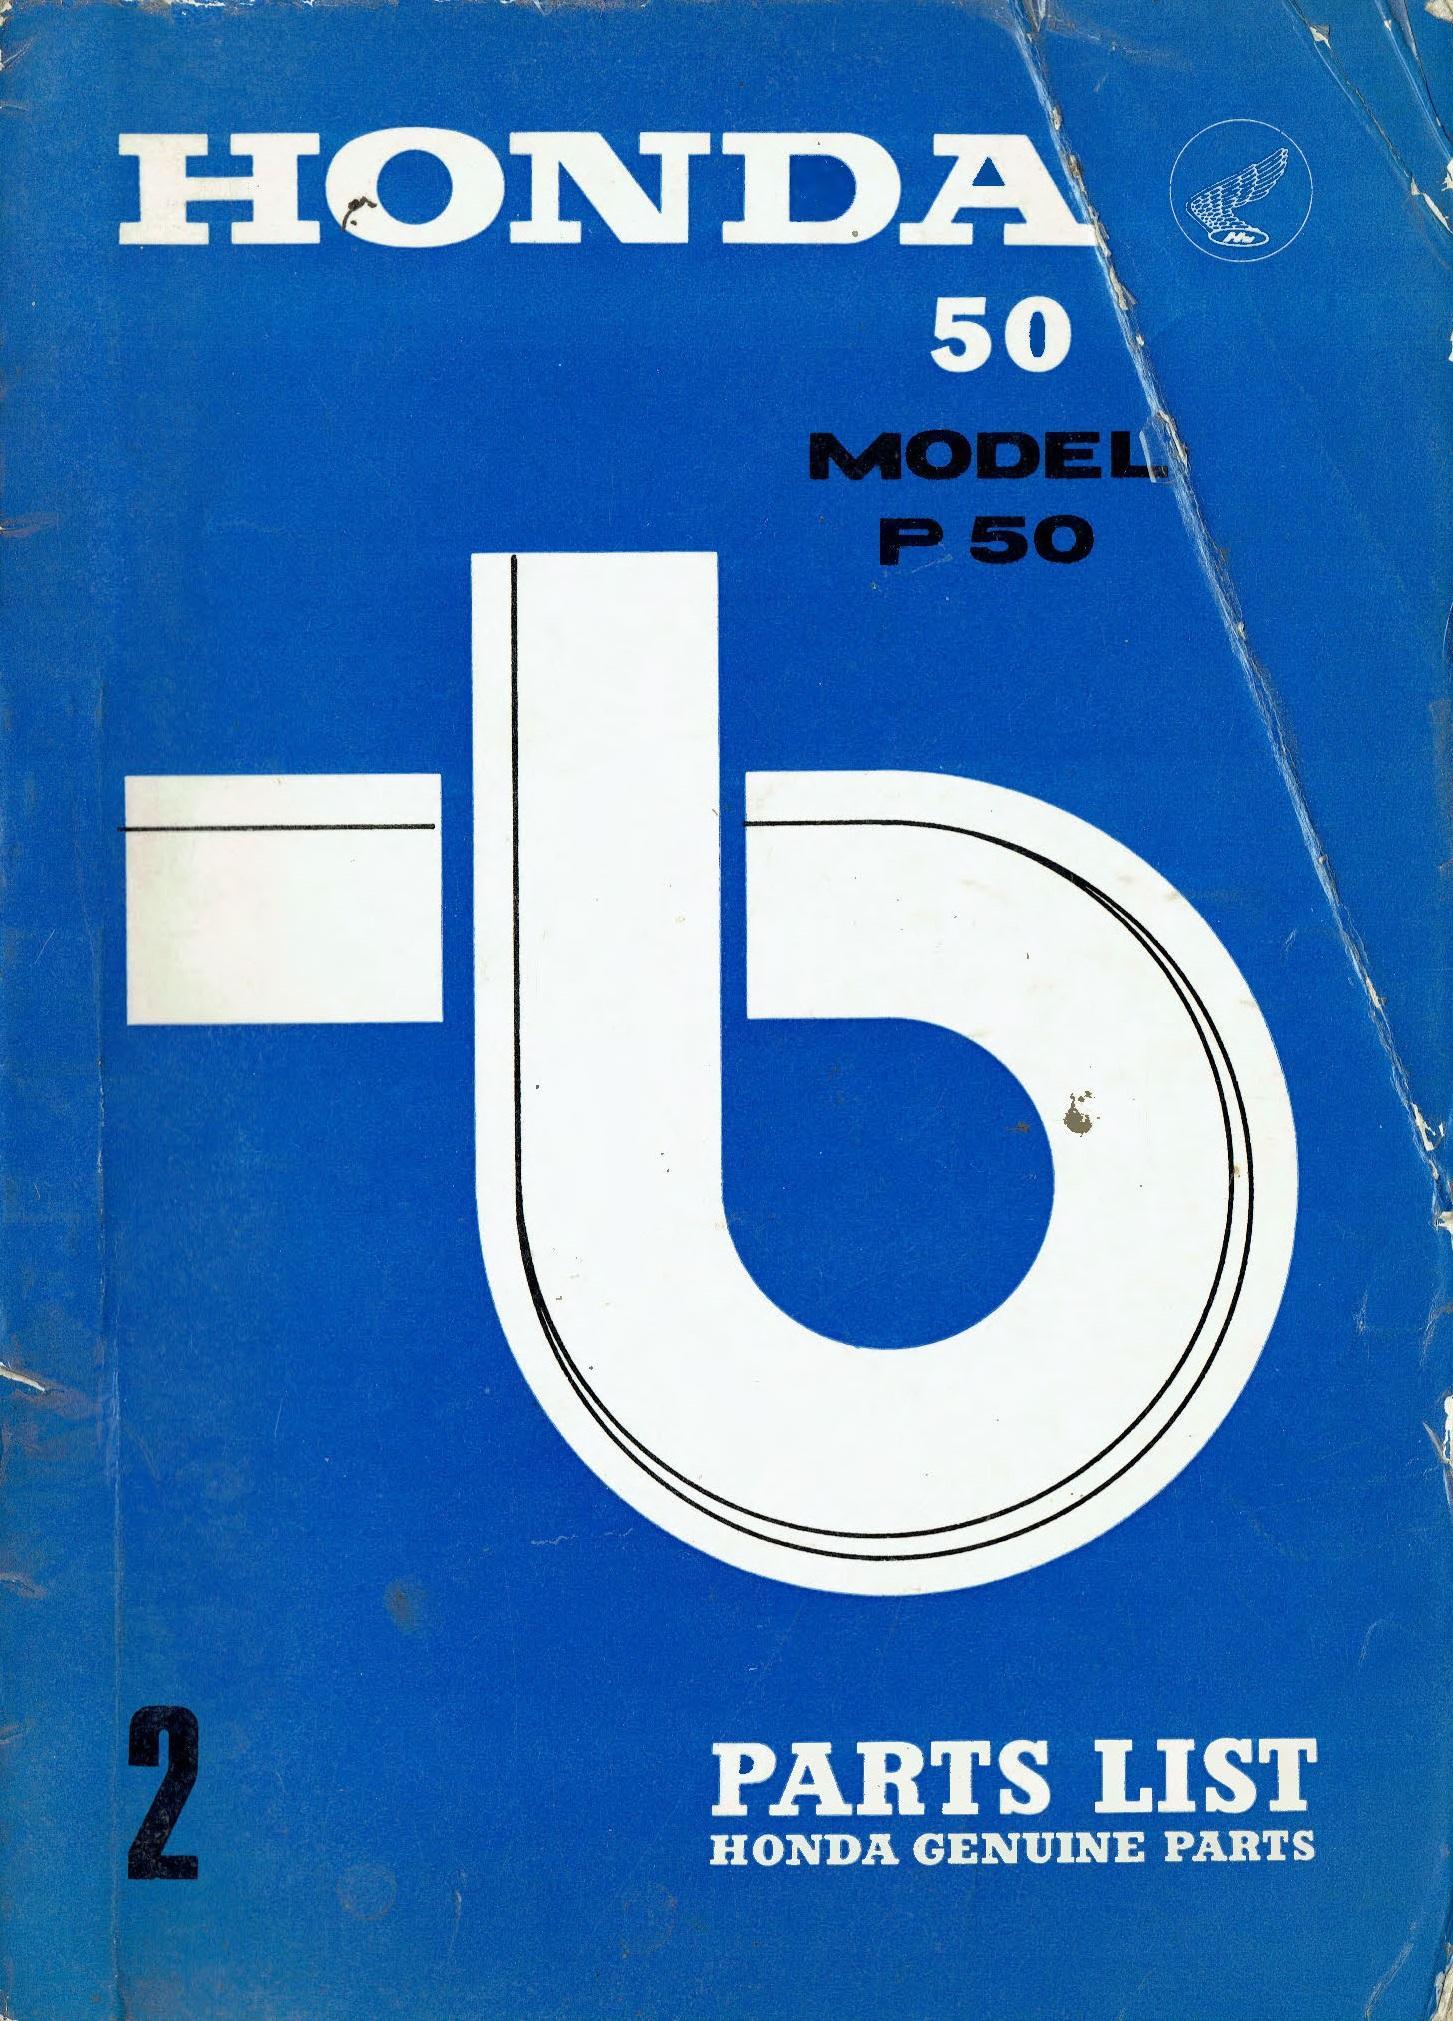 Partslist for Honda P50 (1967)